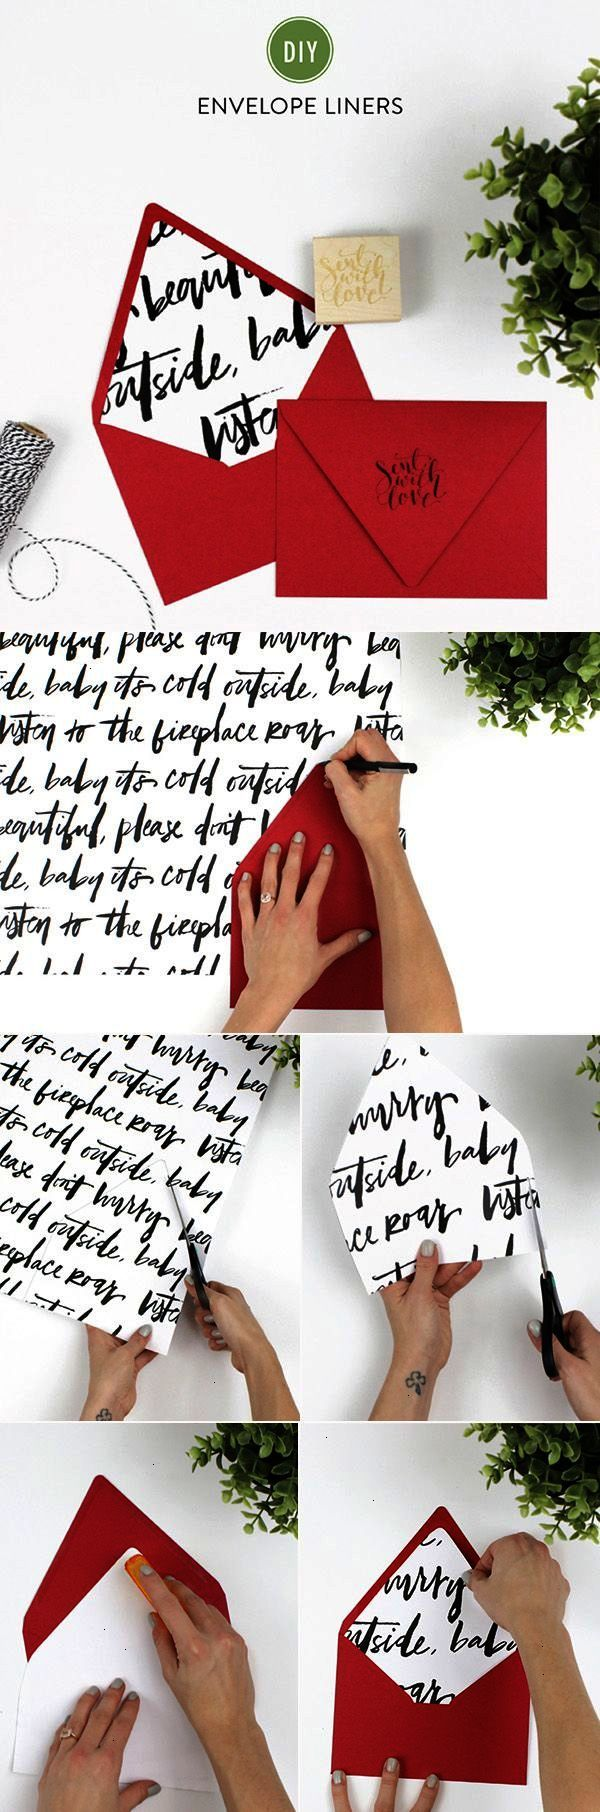 11570 best Wedding Invitations images on Pinterest | Invitation ...